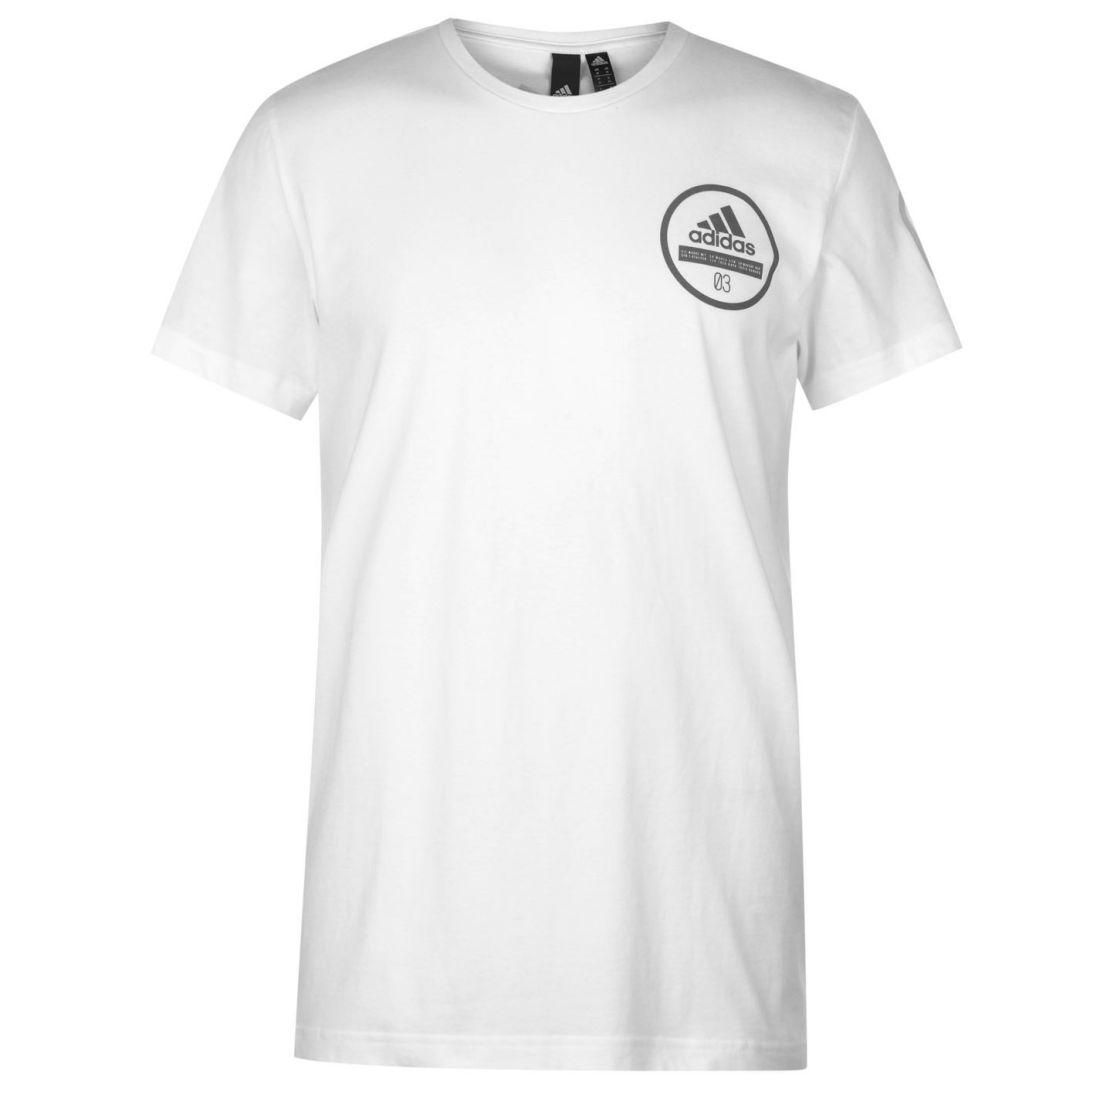 7fd8d40eb389 adidas 360 T Shirt Mens Gents Short Sleeve Performance Tee Top Crew Neck  Cotton